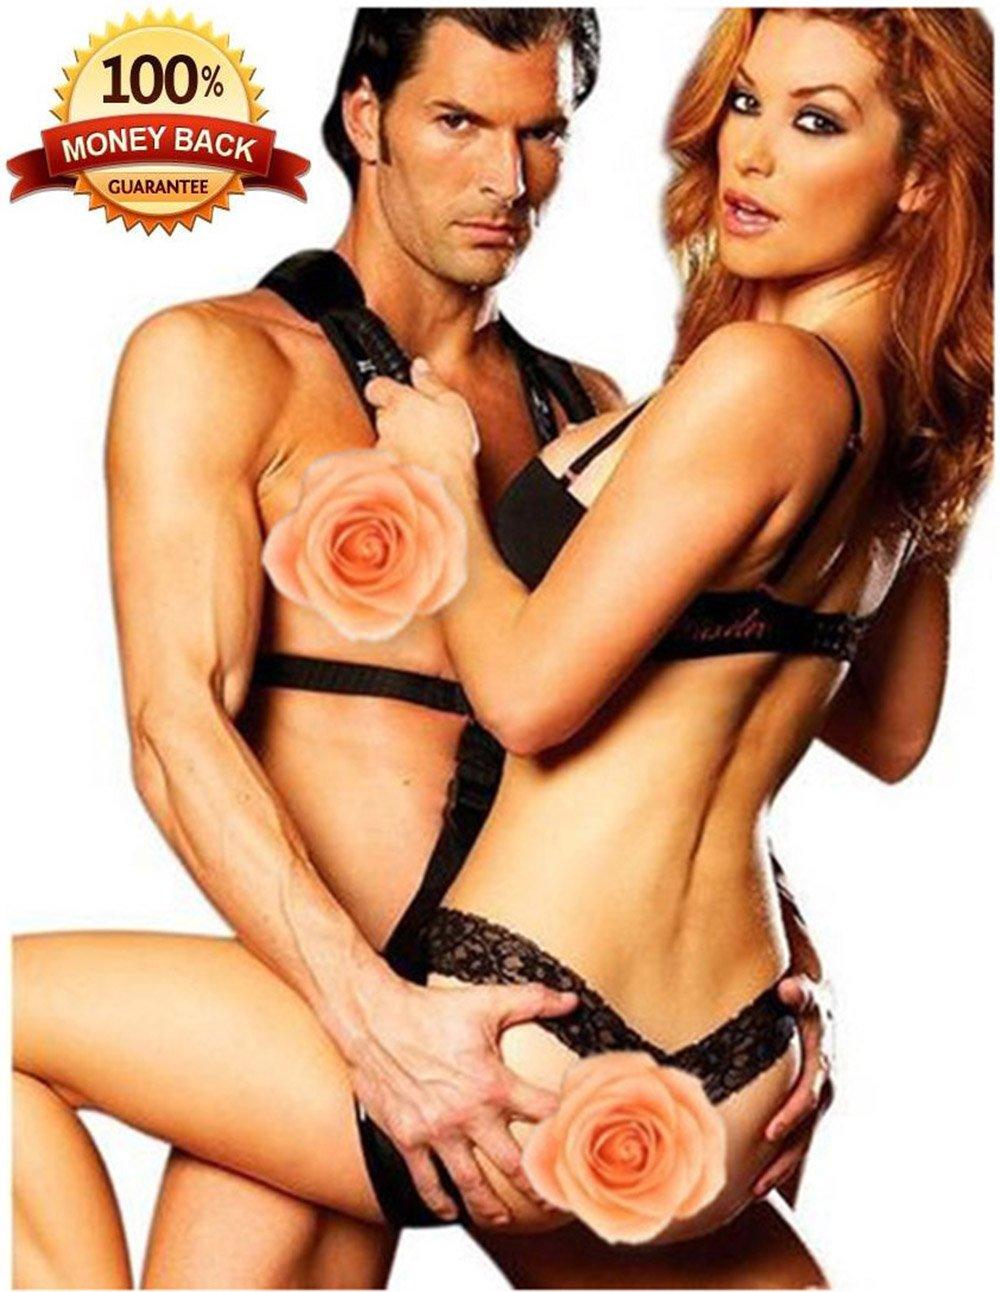 BDSM Bondage Restraint Love Swings Sex Toy-BELSIANG Funny Couple Sex Swing - Room & Travel Necessities